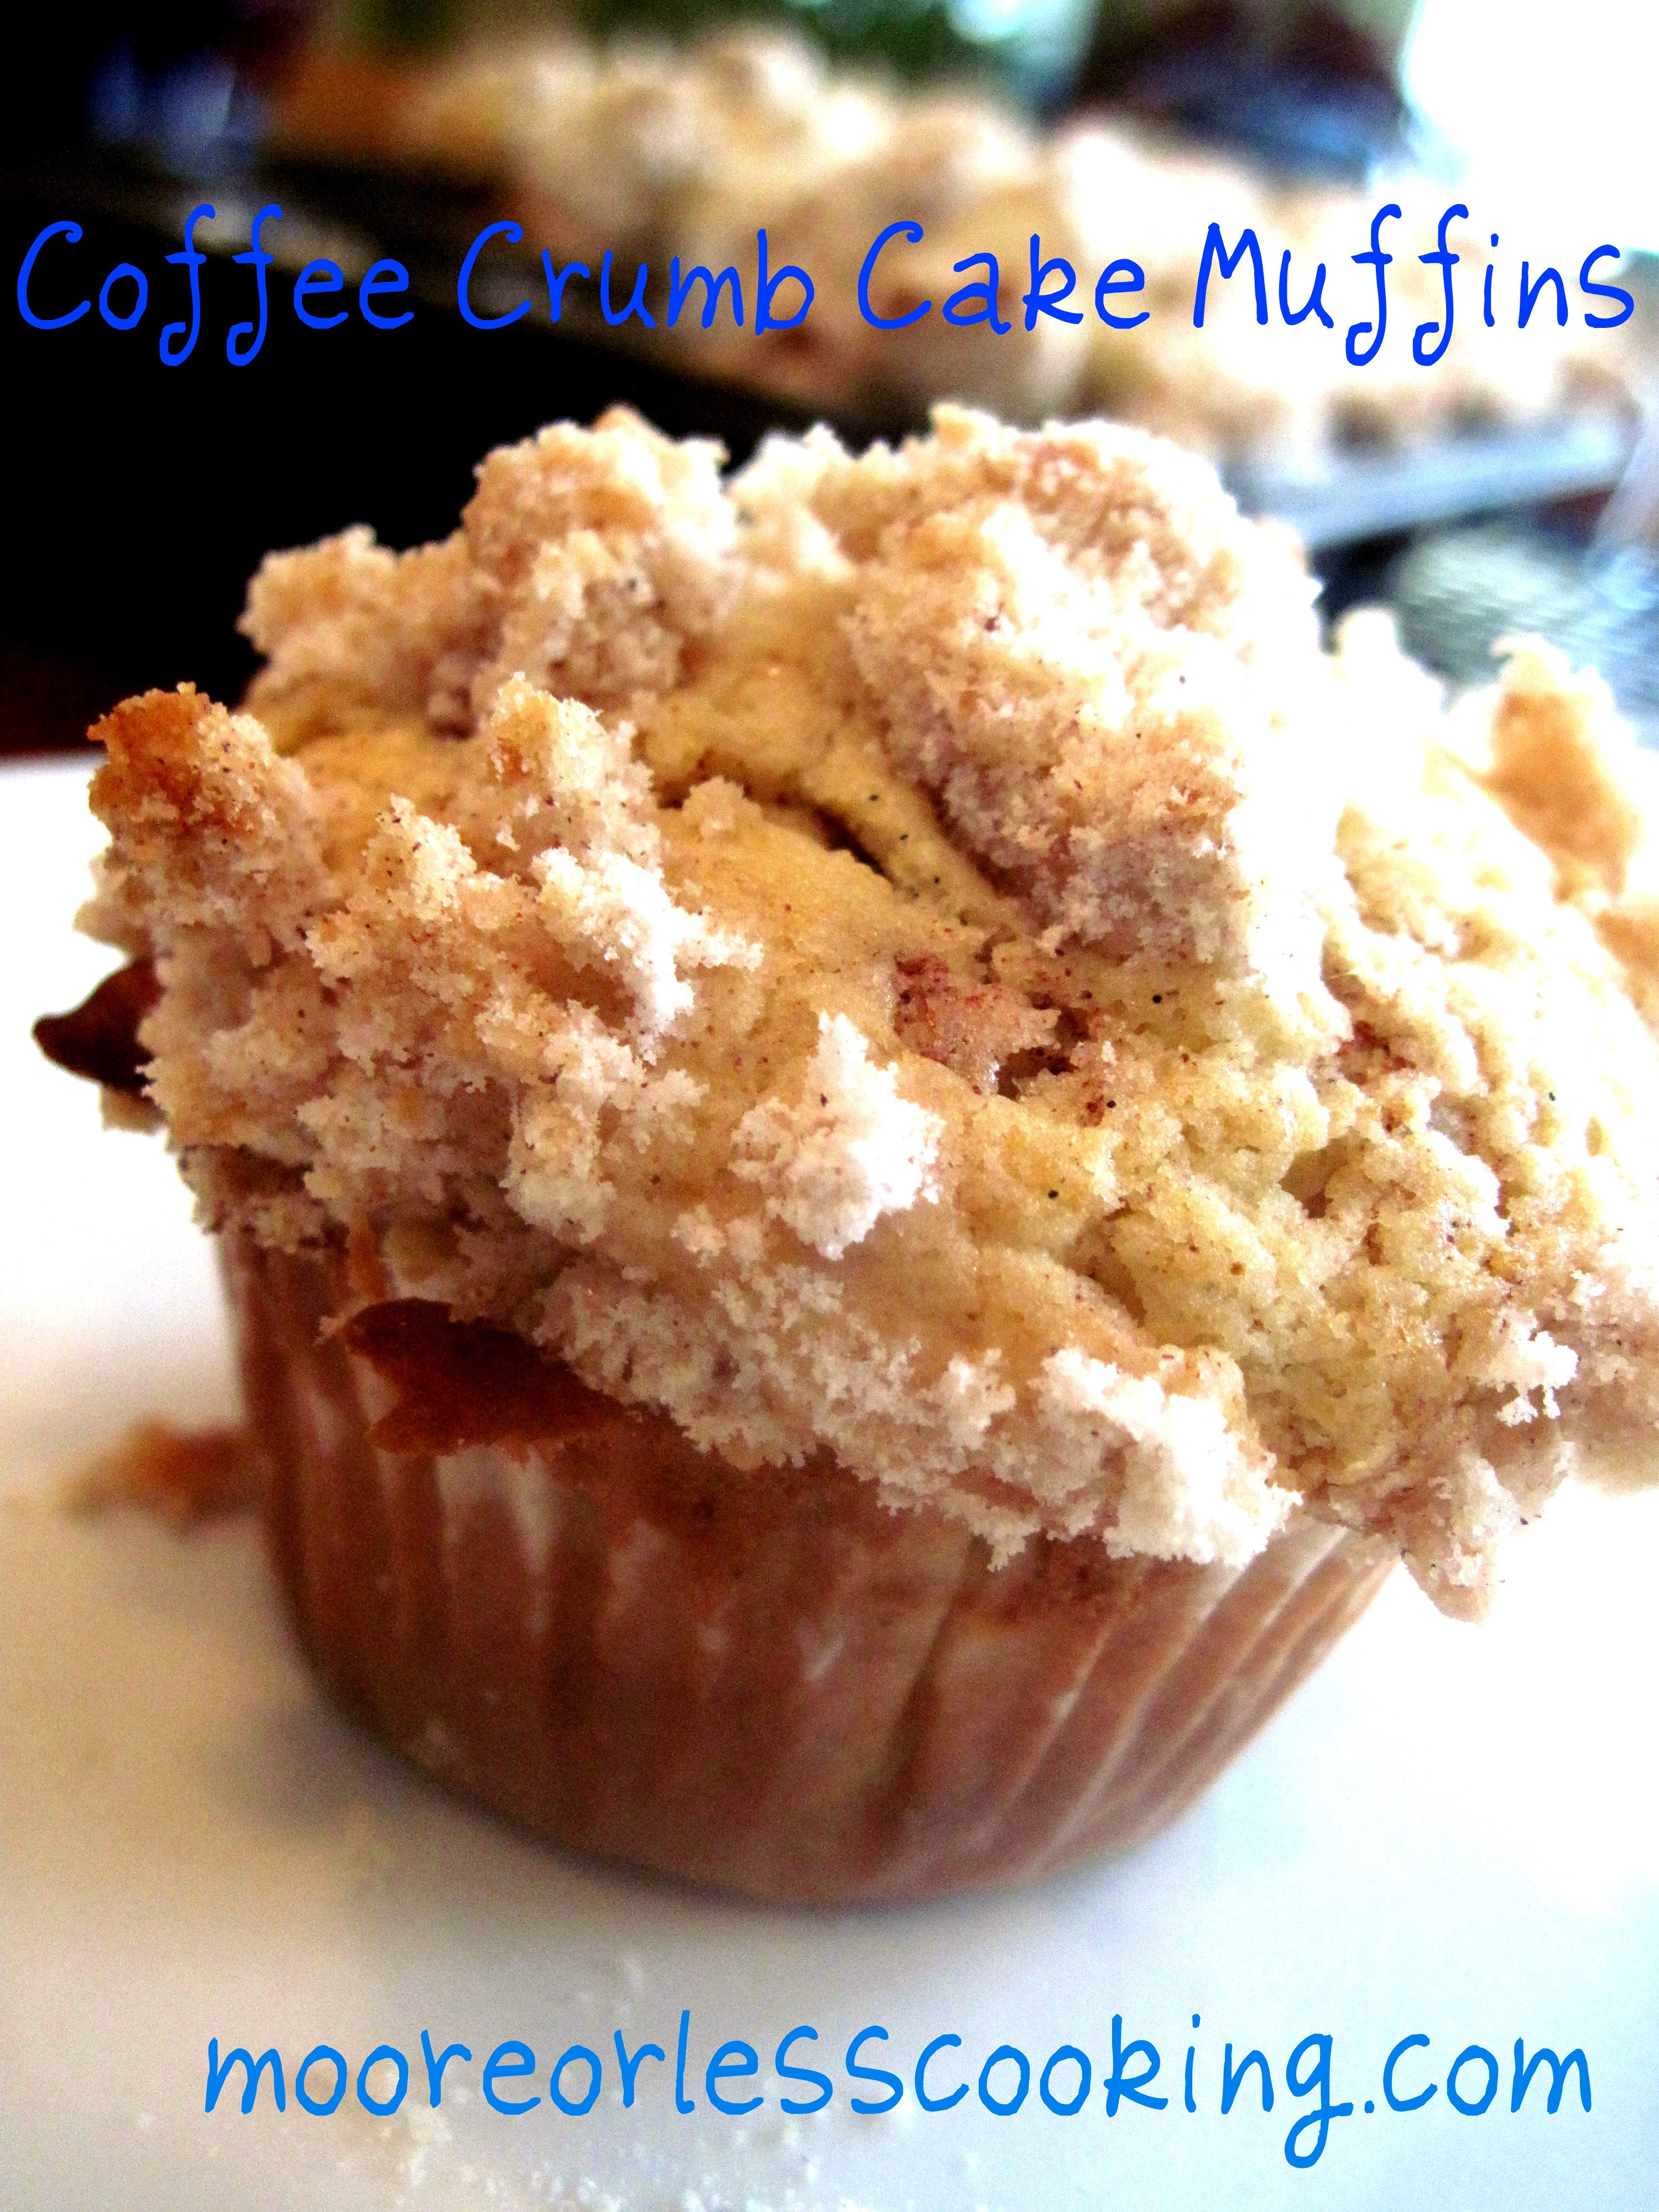 Coffee Cake Muffins  Coffee Crumb Cake Muffins